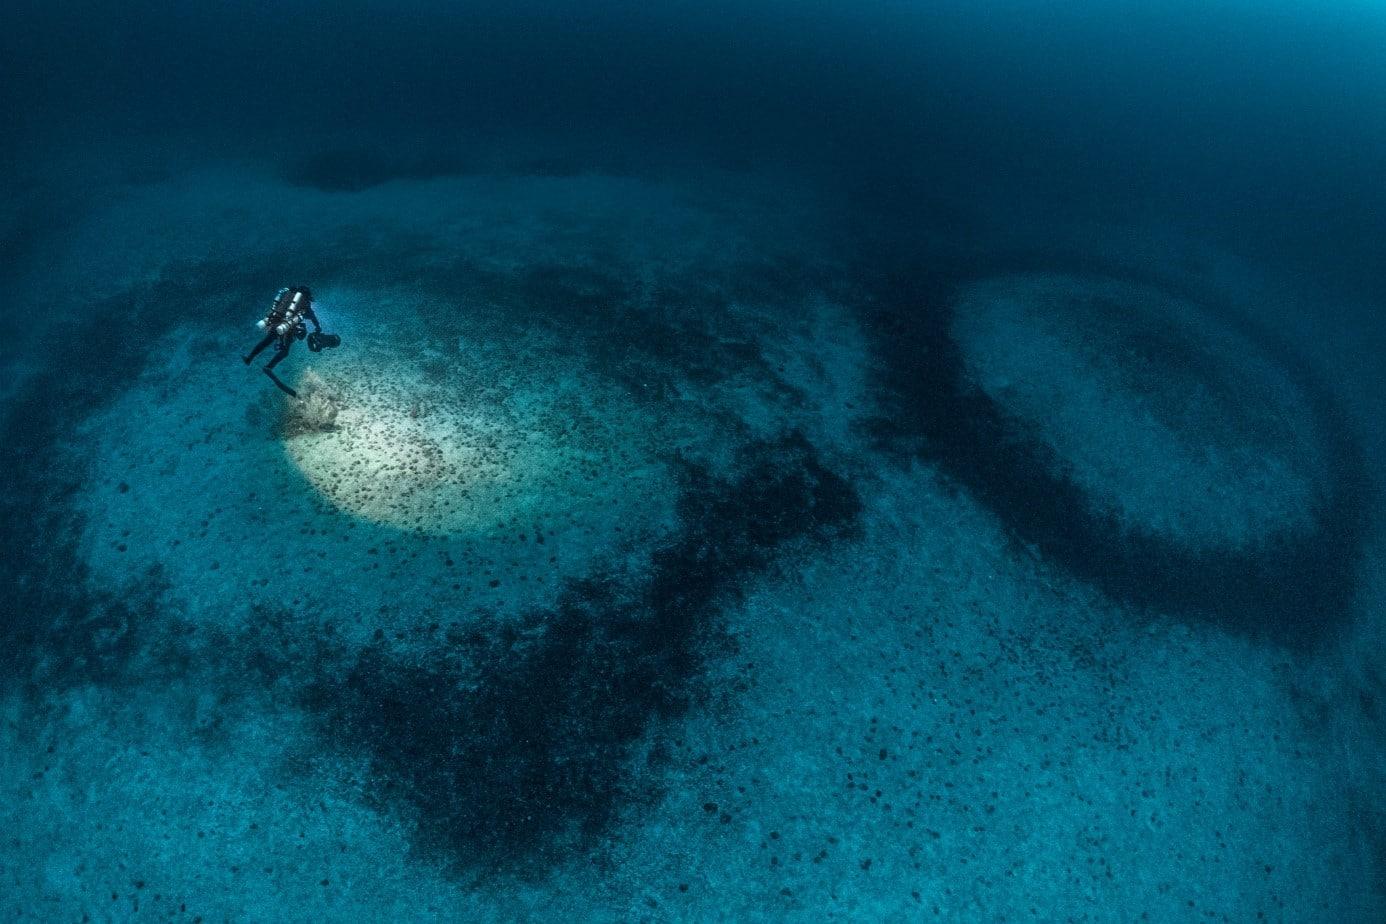 Atolls_coralligene2